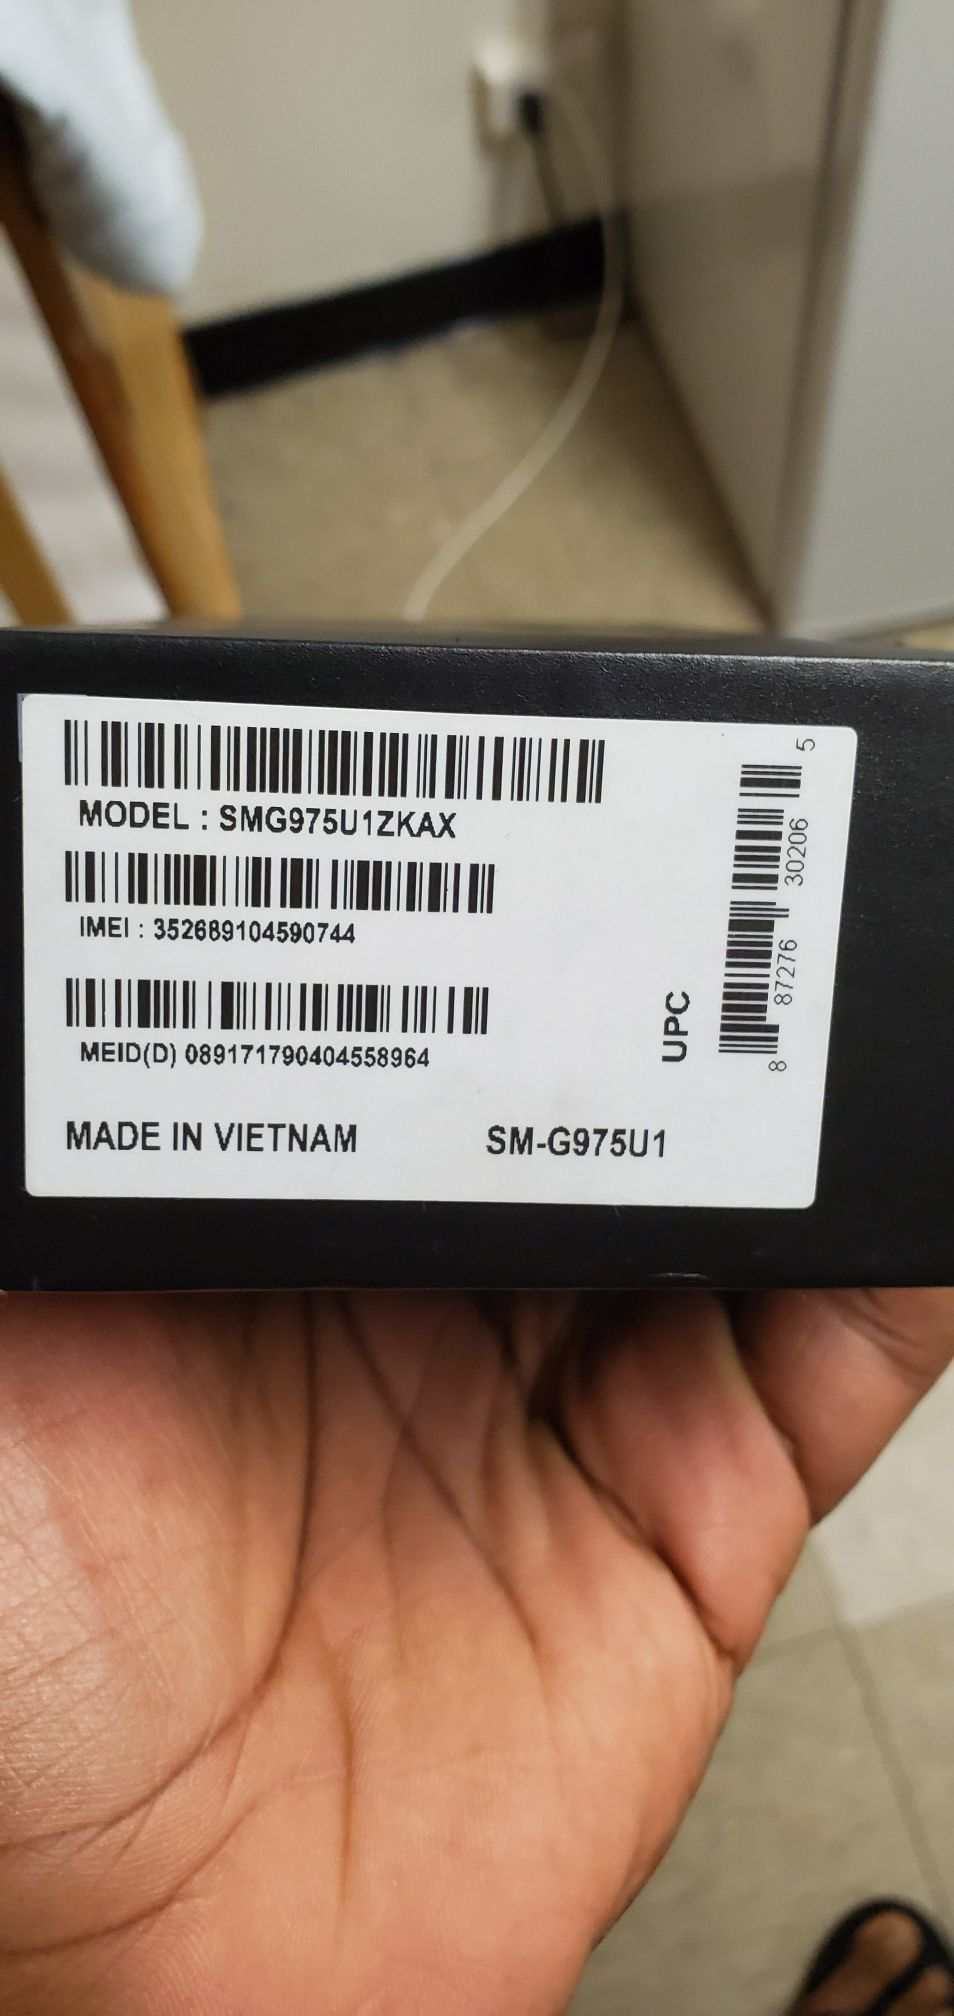 Samsung Galaxy s10 plus unlock × Samsung Galaxy smartwatche